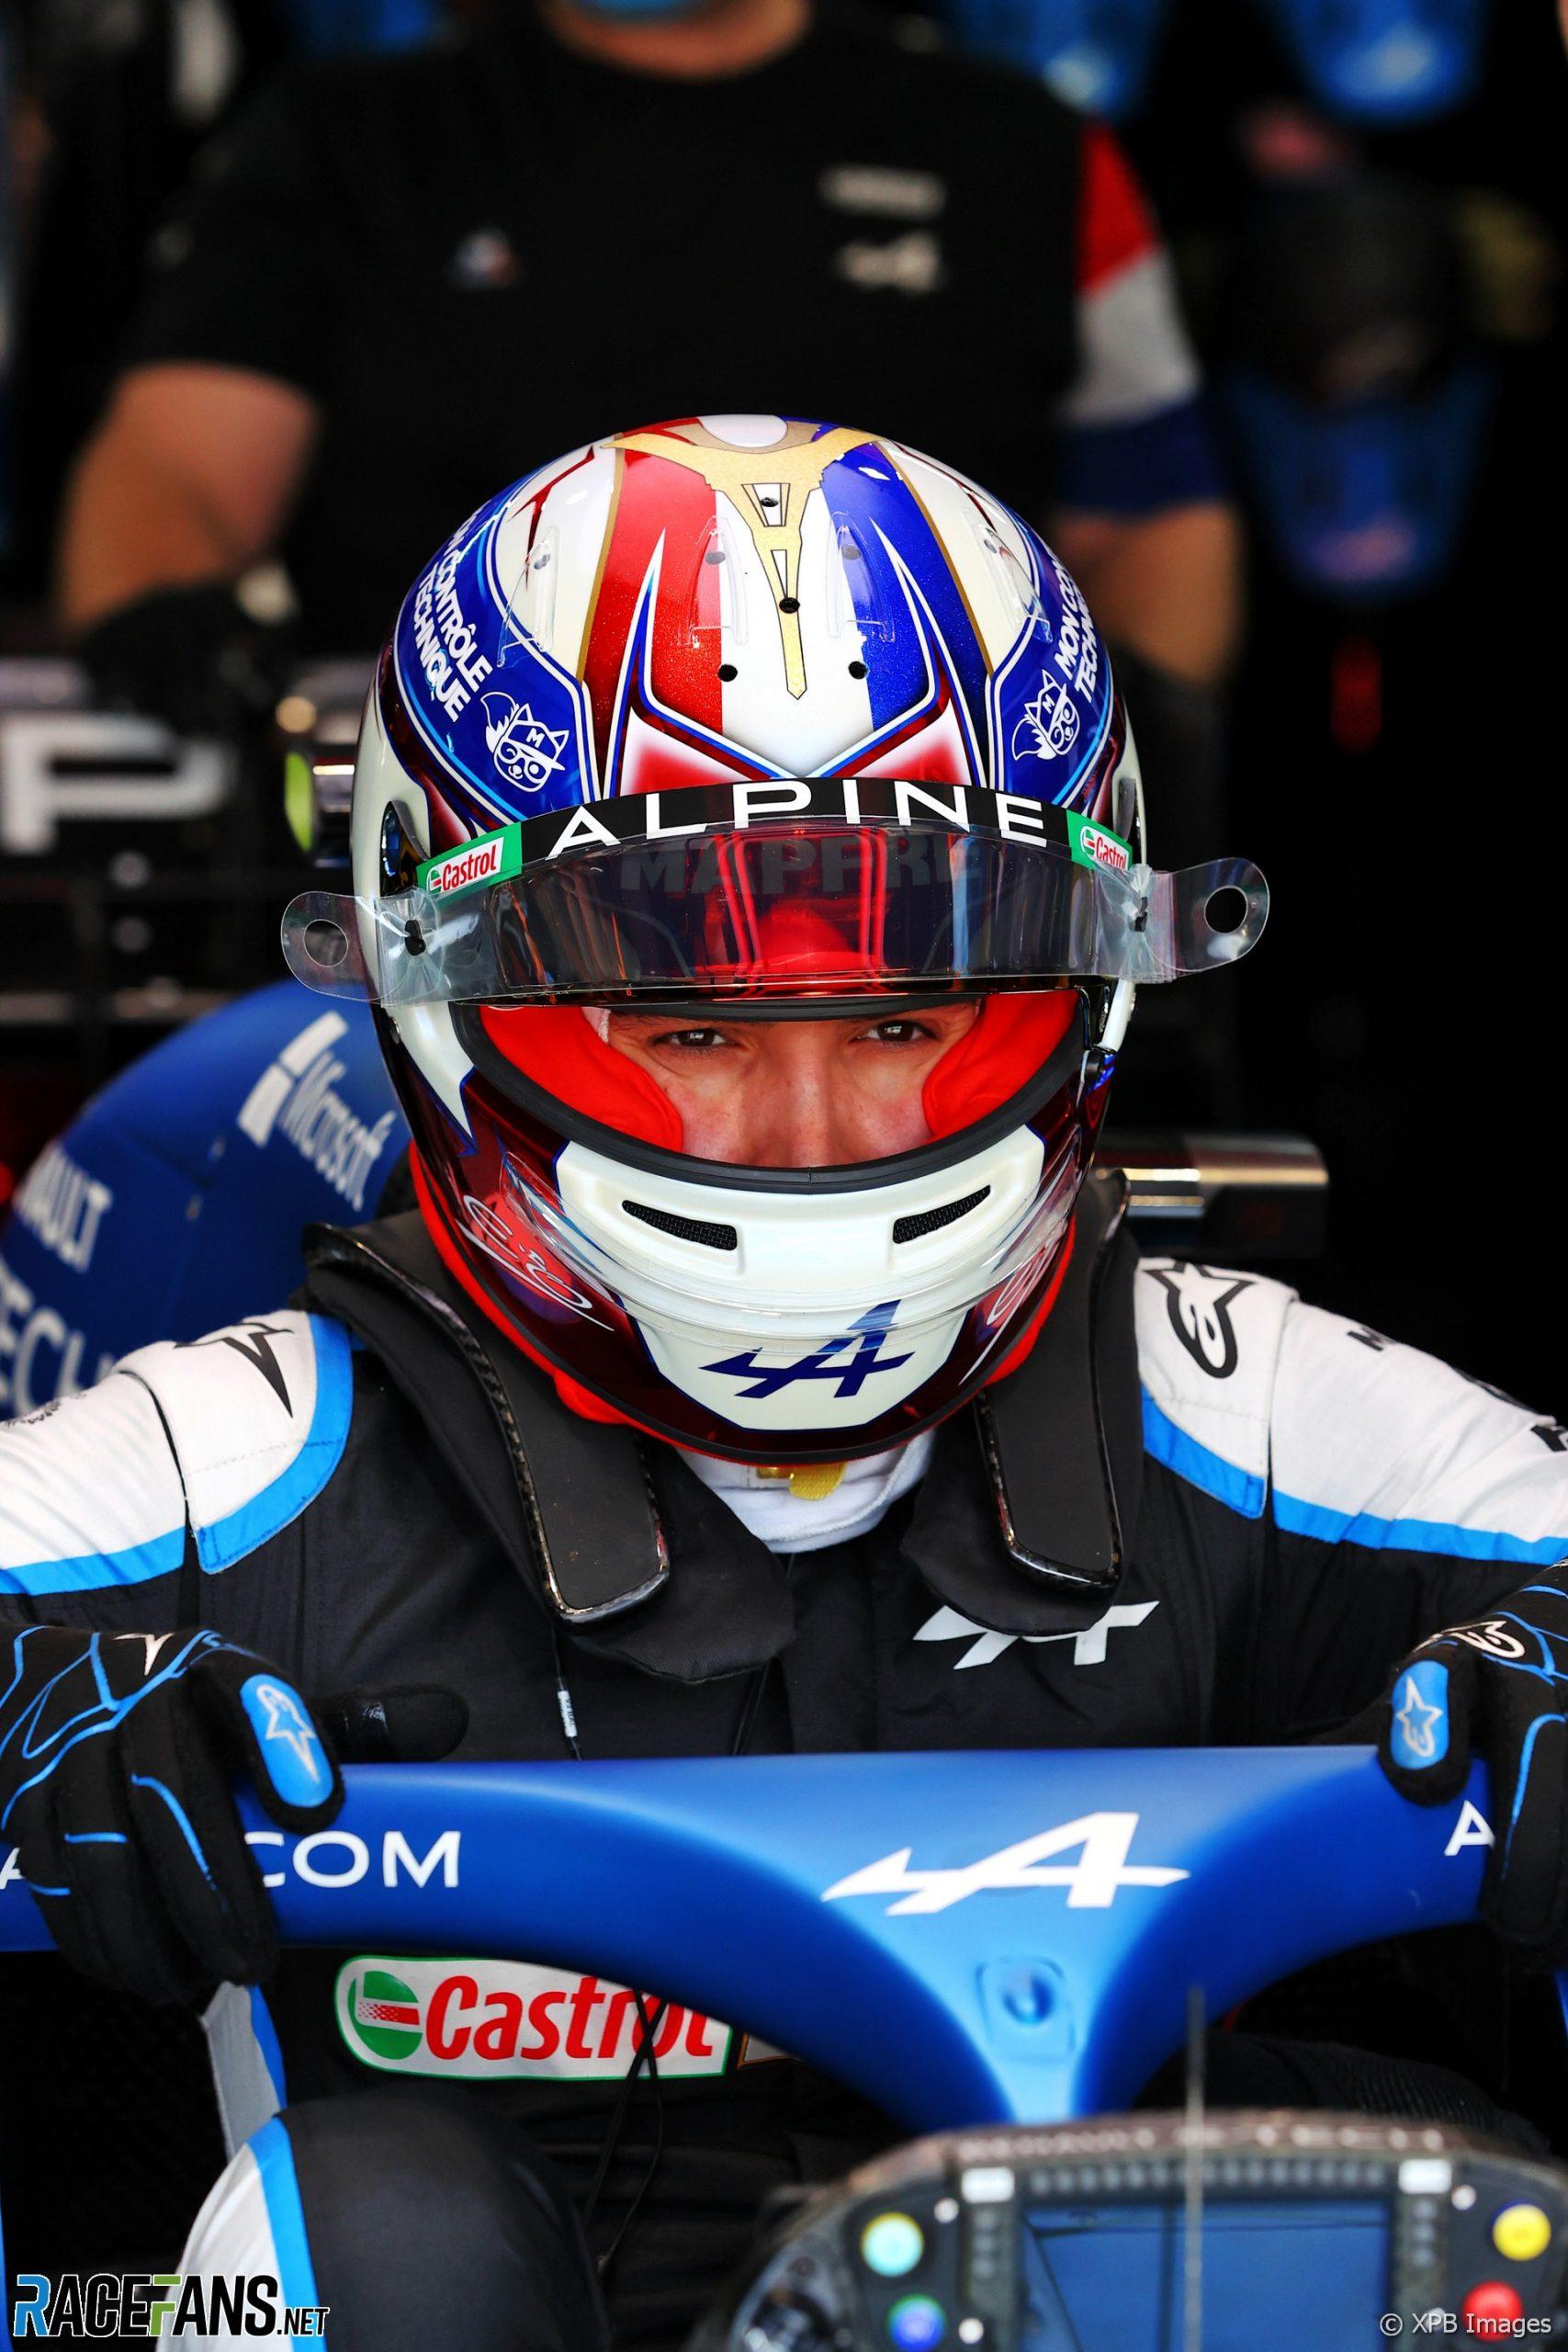 Esteban Ocon's 2021 French Grand Prix helmet